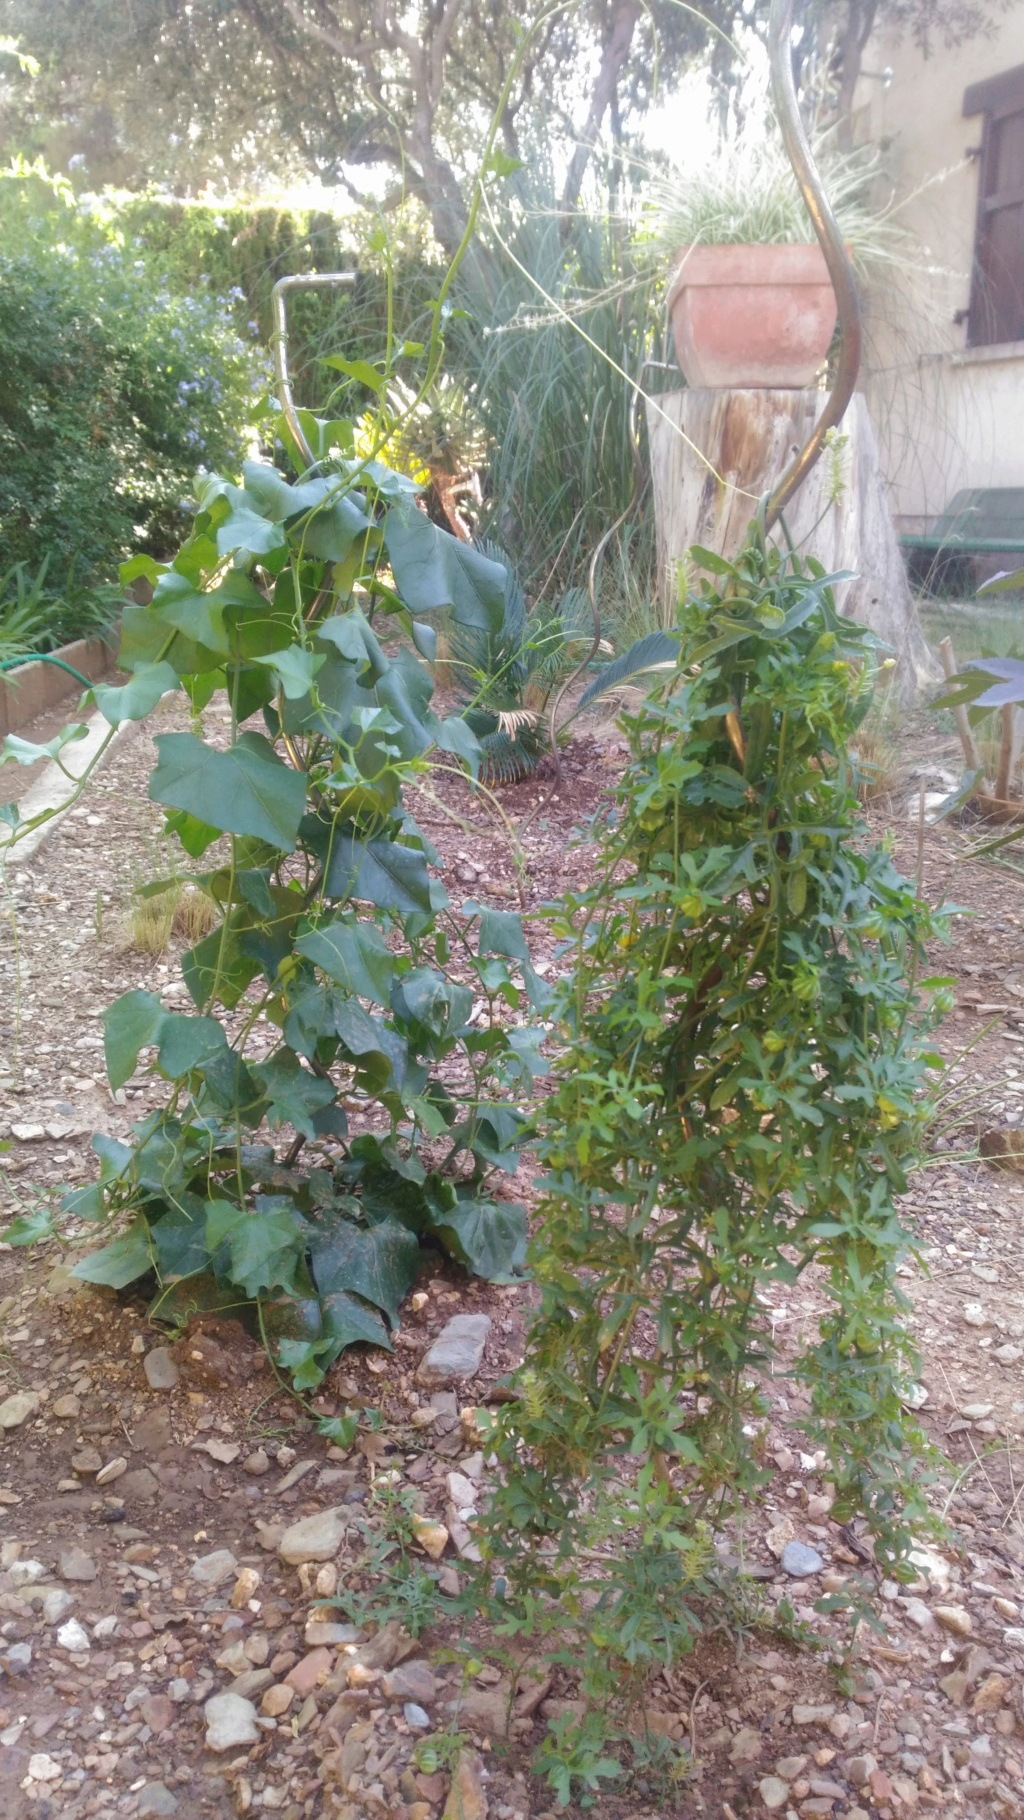 Mes semis : Gerrardanthus macrorhizus, Kedrostis africana, Ibervillea tenuisecta... - Page 2 P_201815